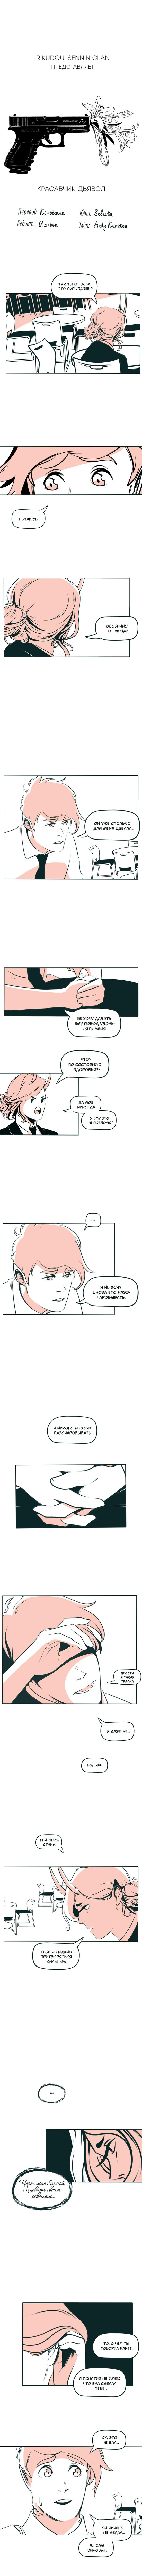 https://r1.ninemanga.com/comics/pic2/0/33536/428245/1535361849833.jpg Page 3